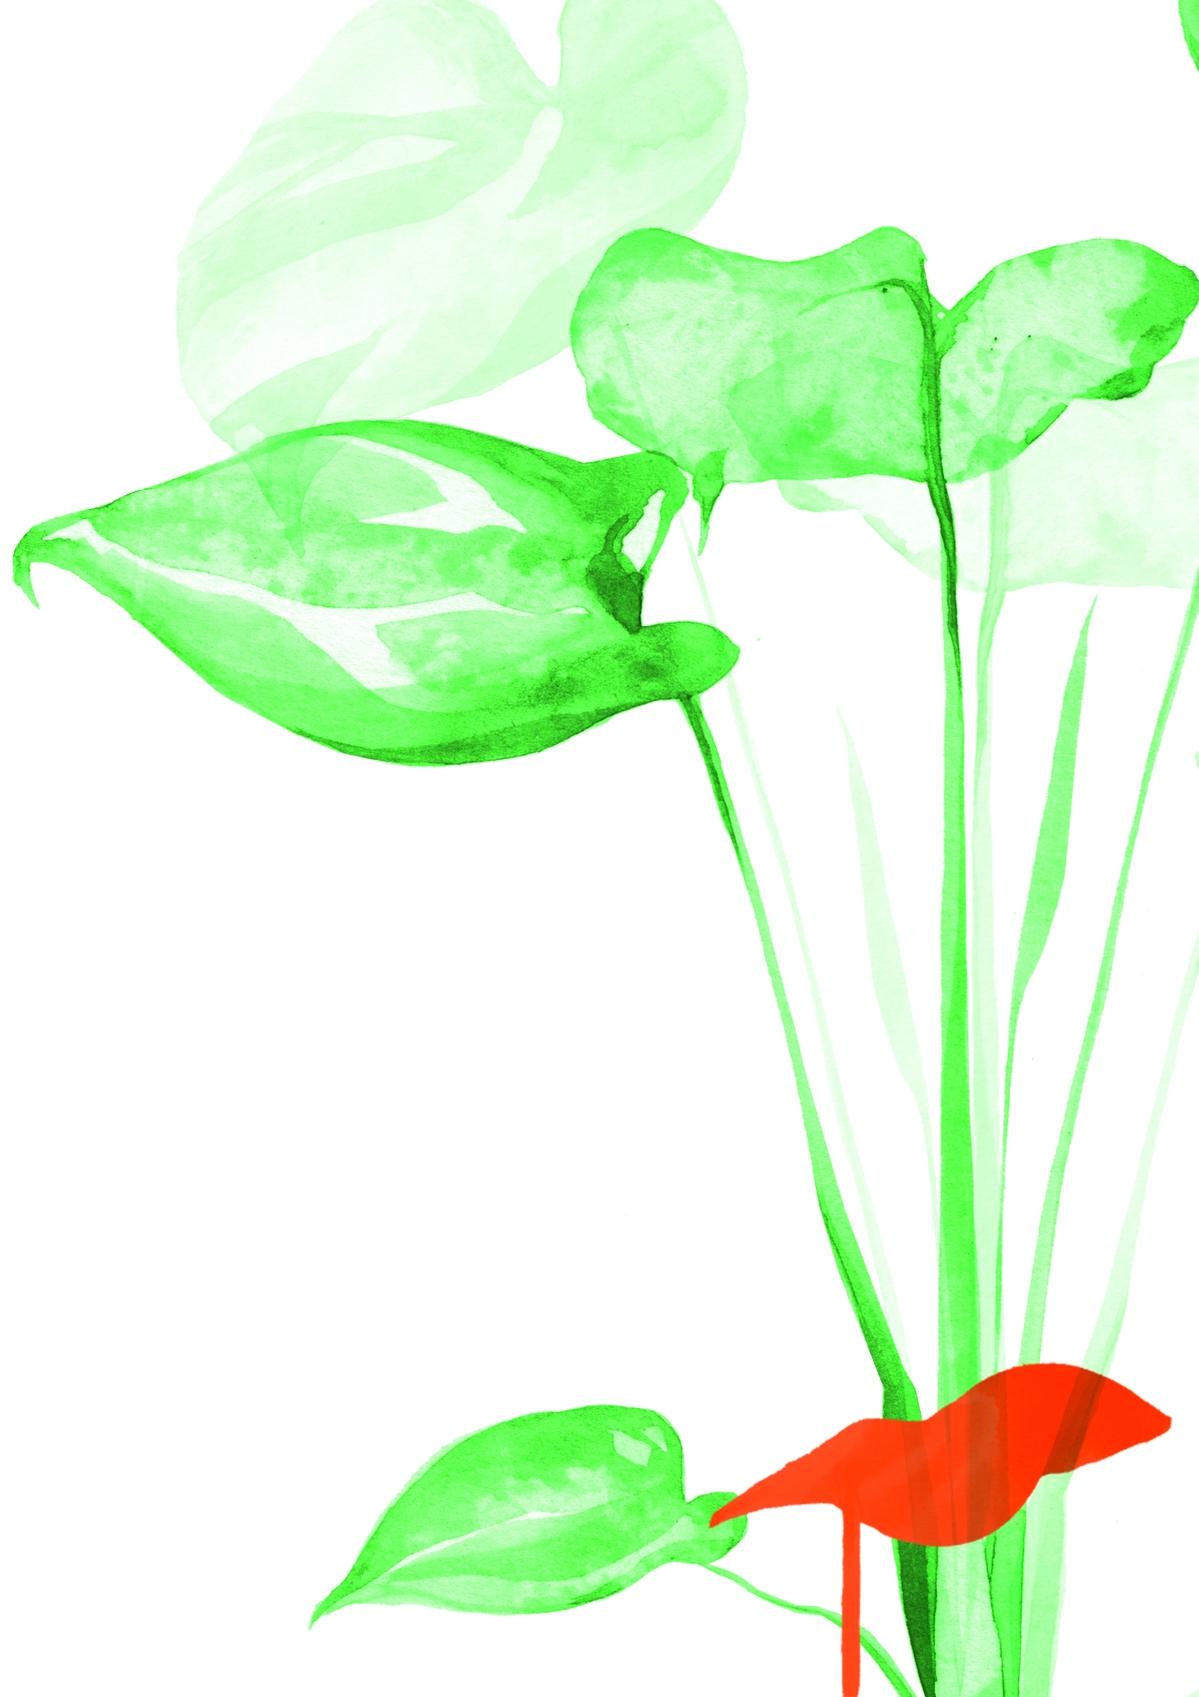 joannalayla_greenfingers_designforalyusha_leaf